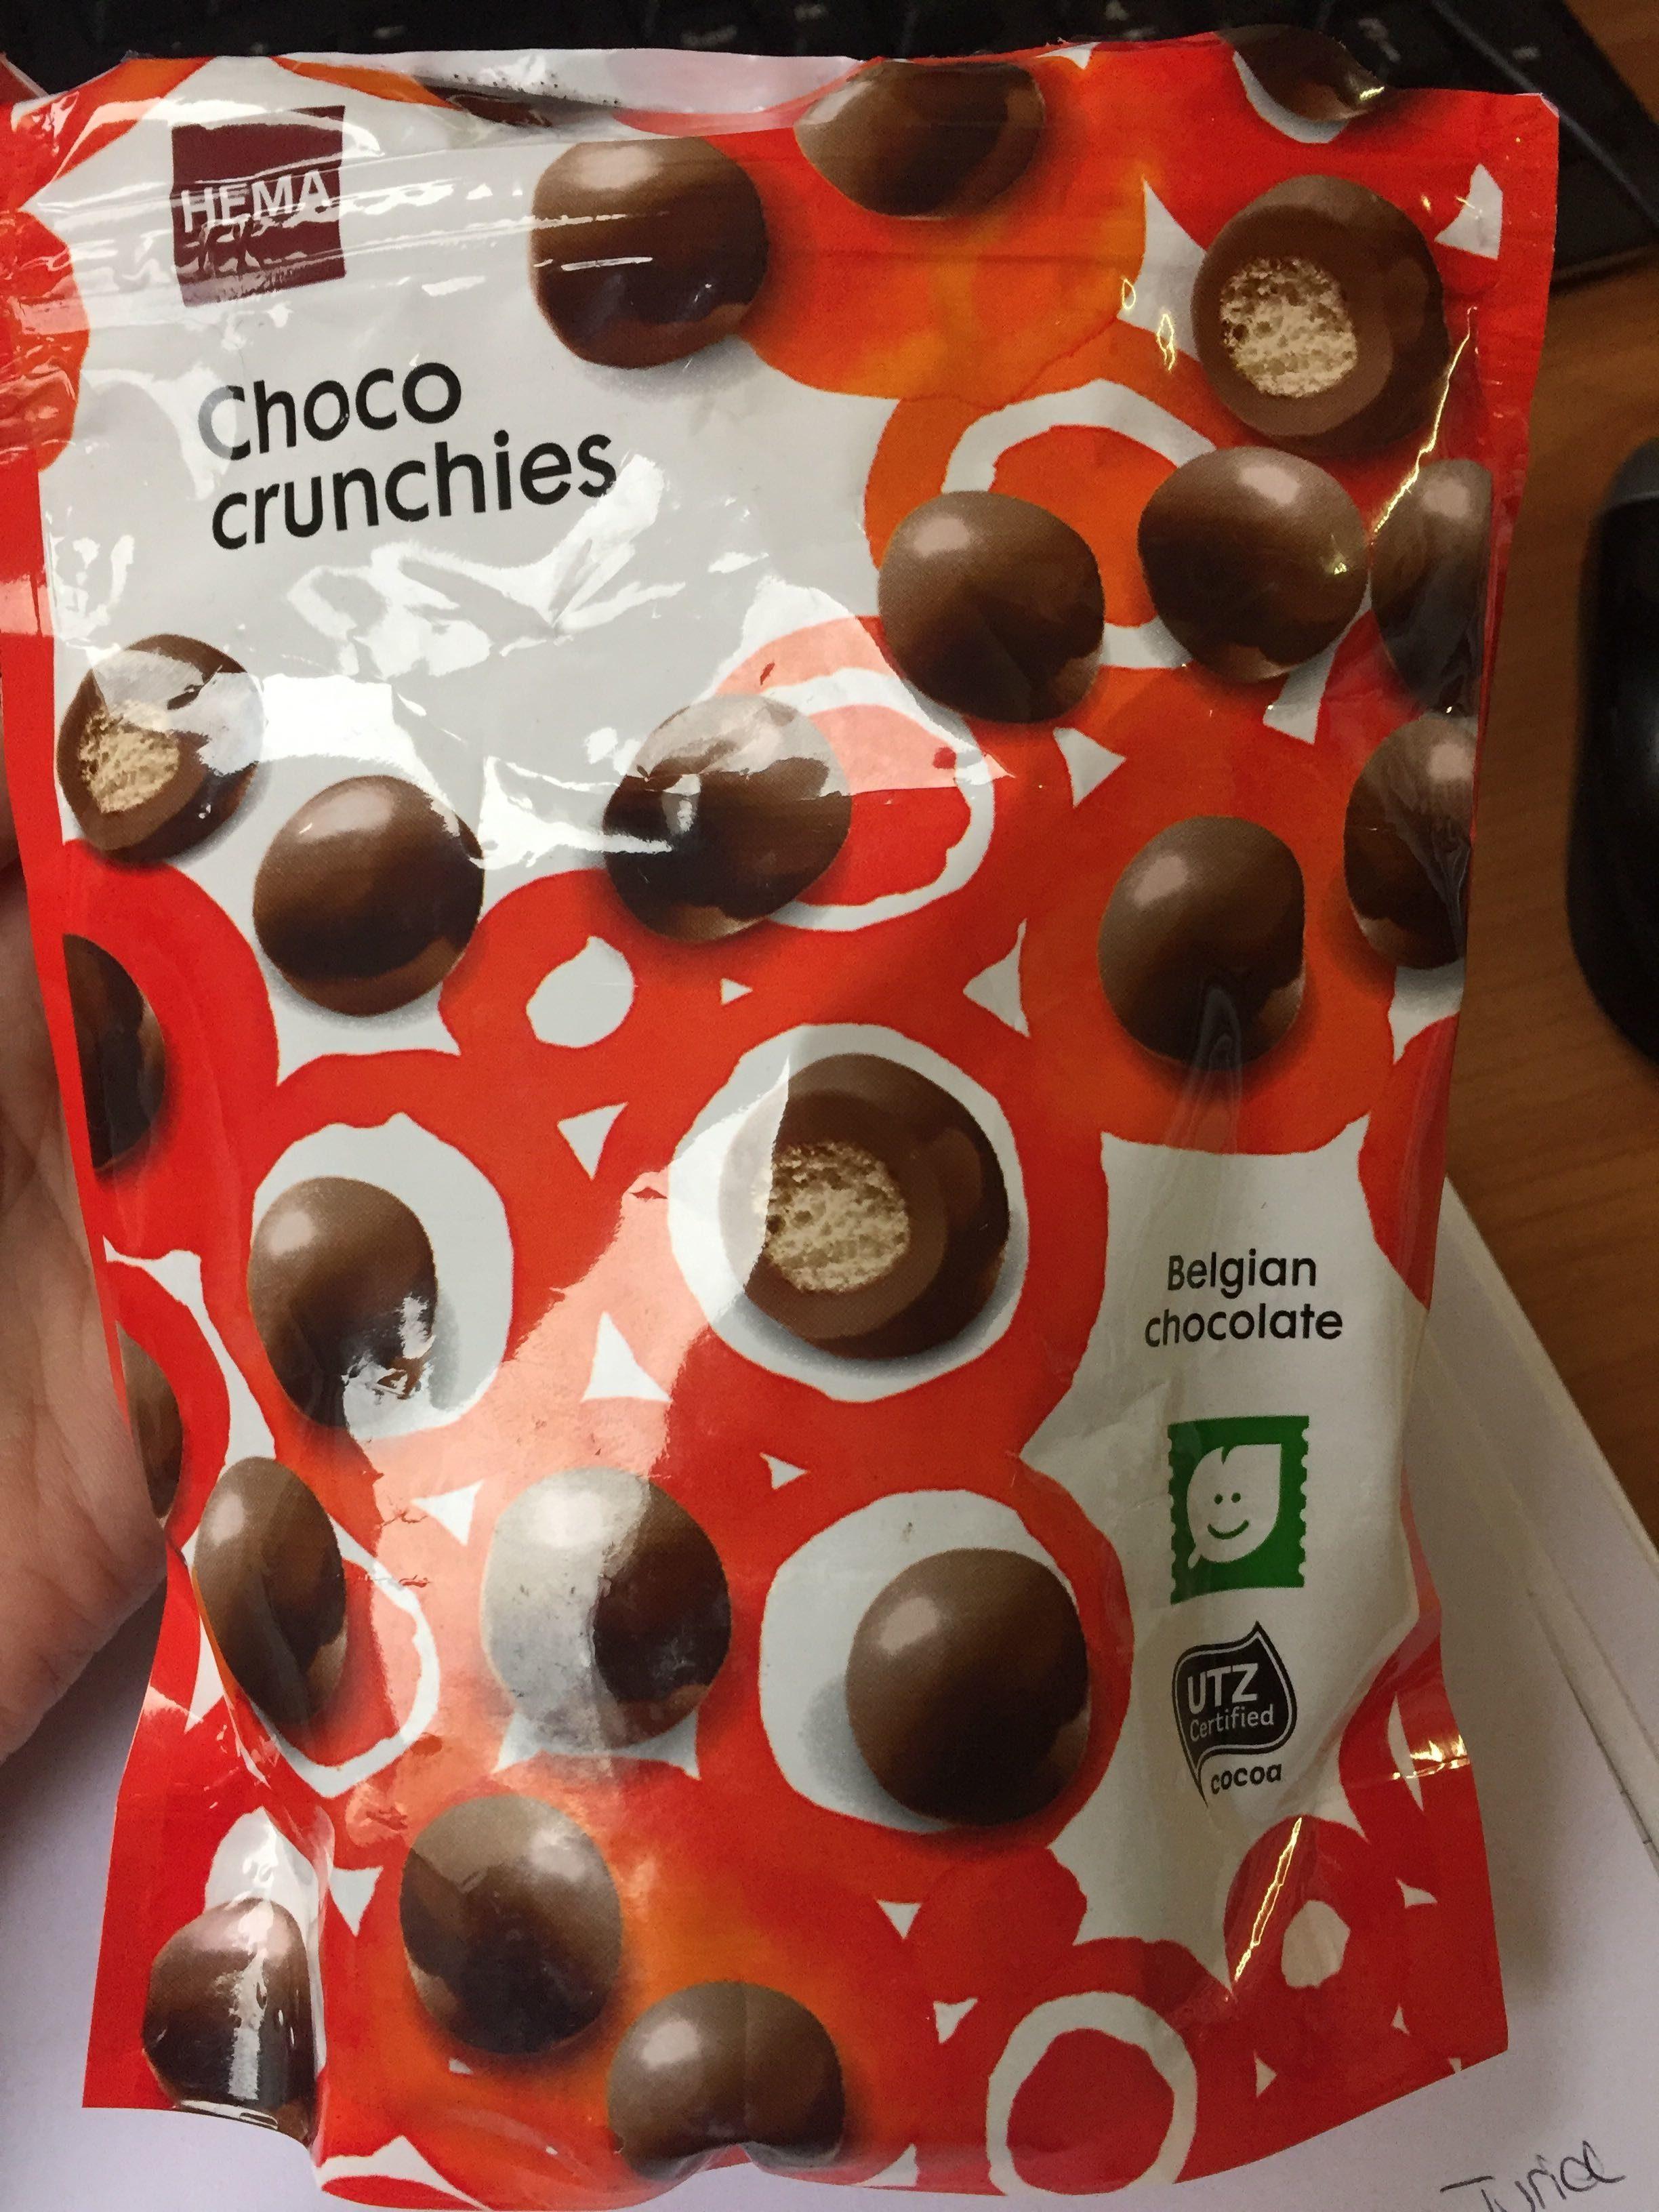 Choco crunchies - Product